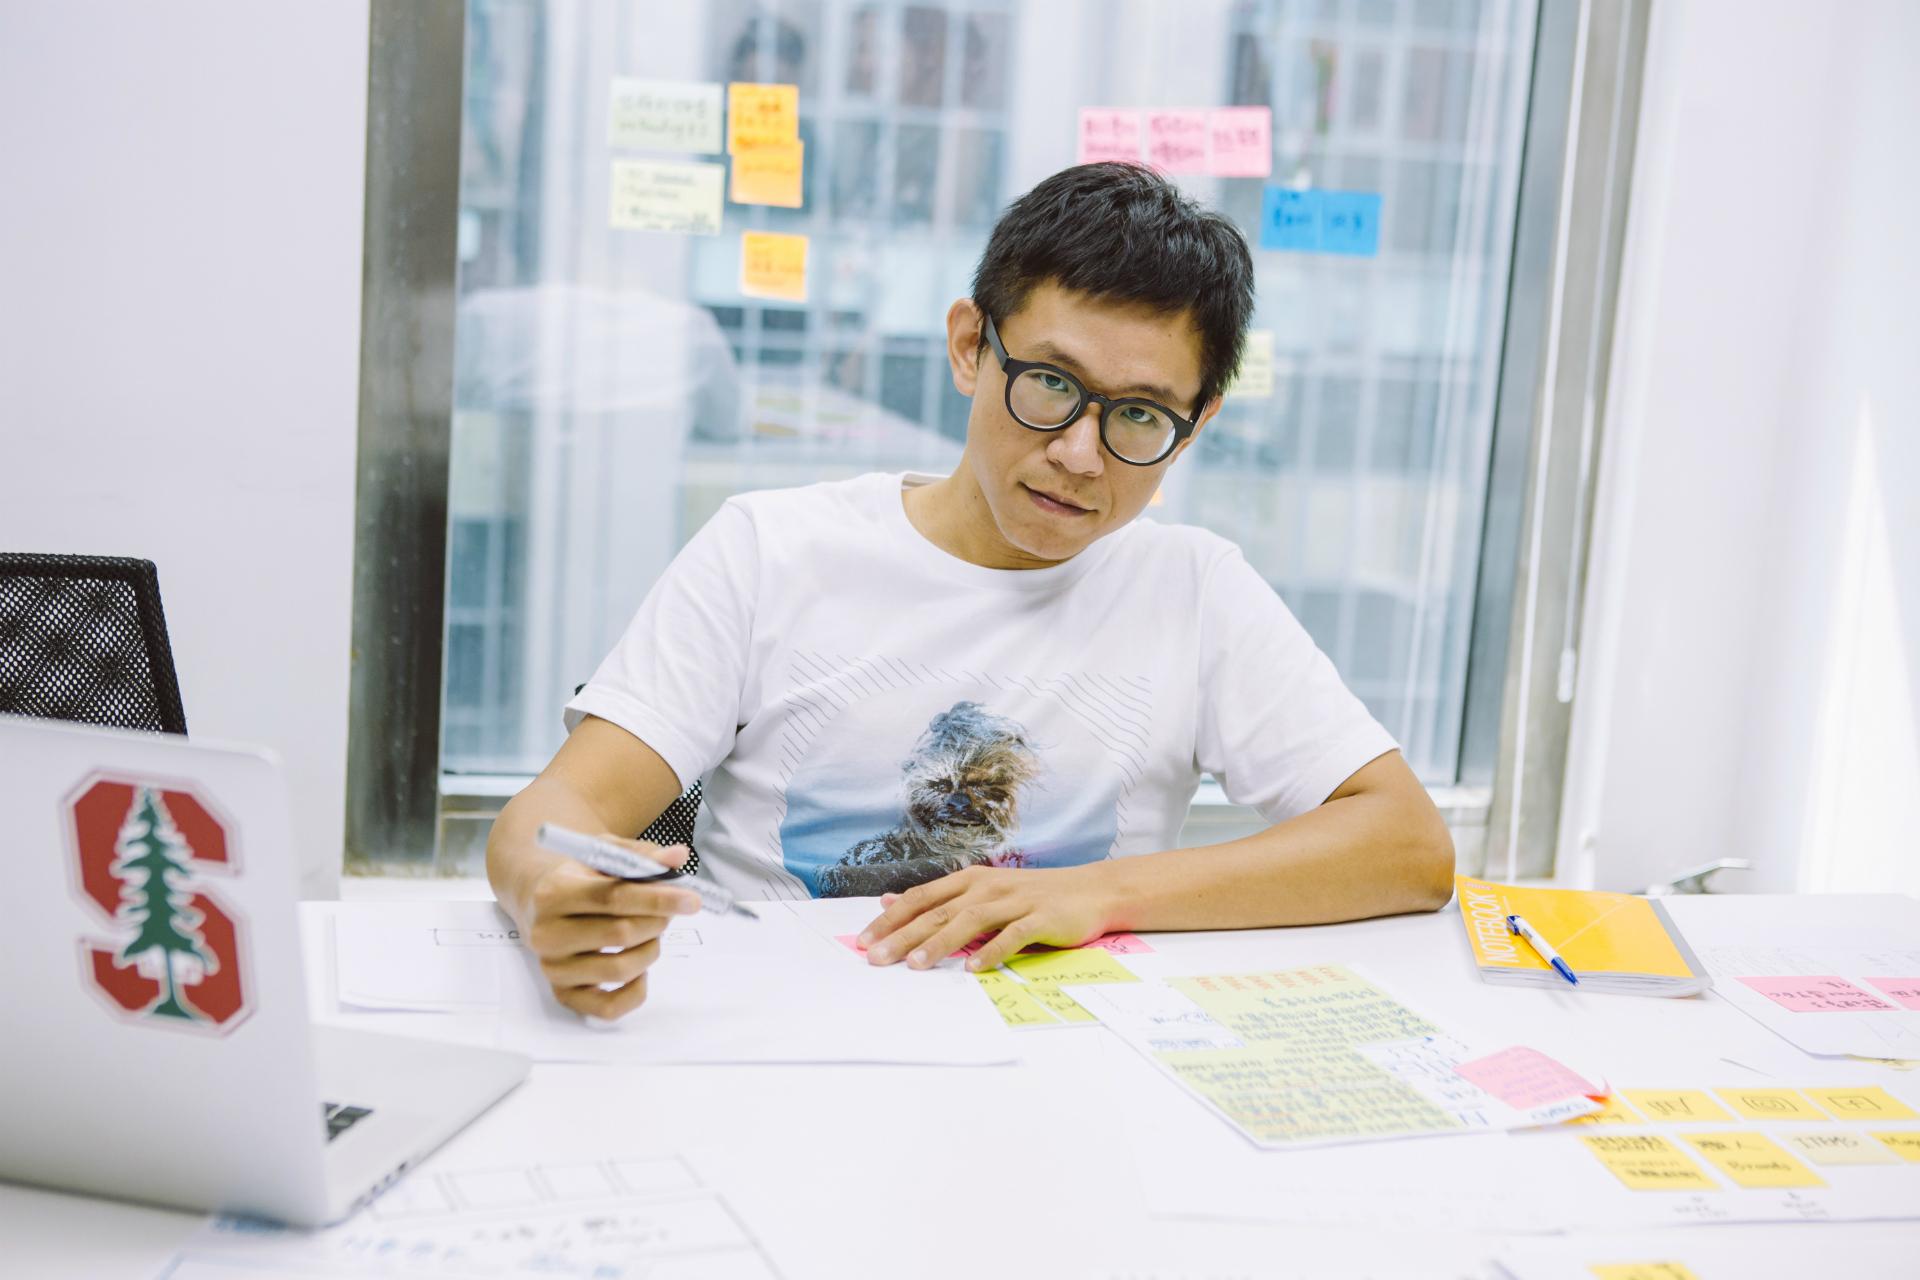 認識你未來的公司 Kono – Design Manager, 凡碩